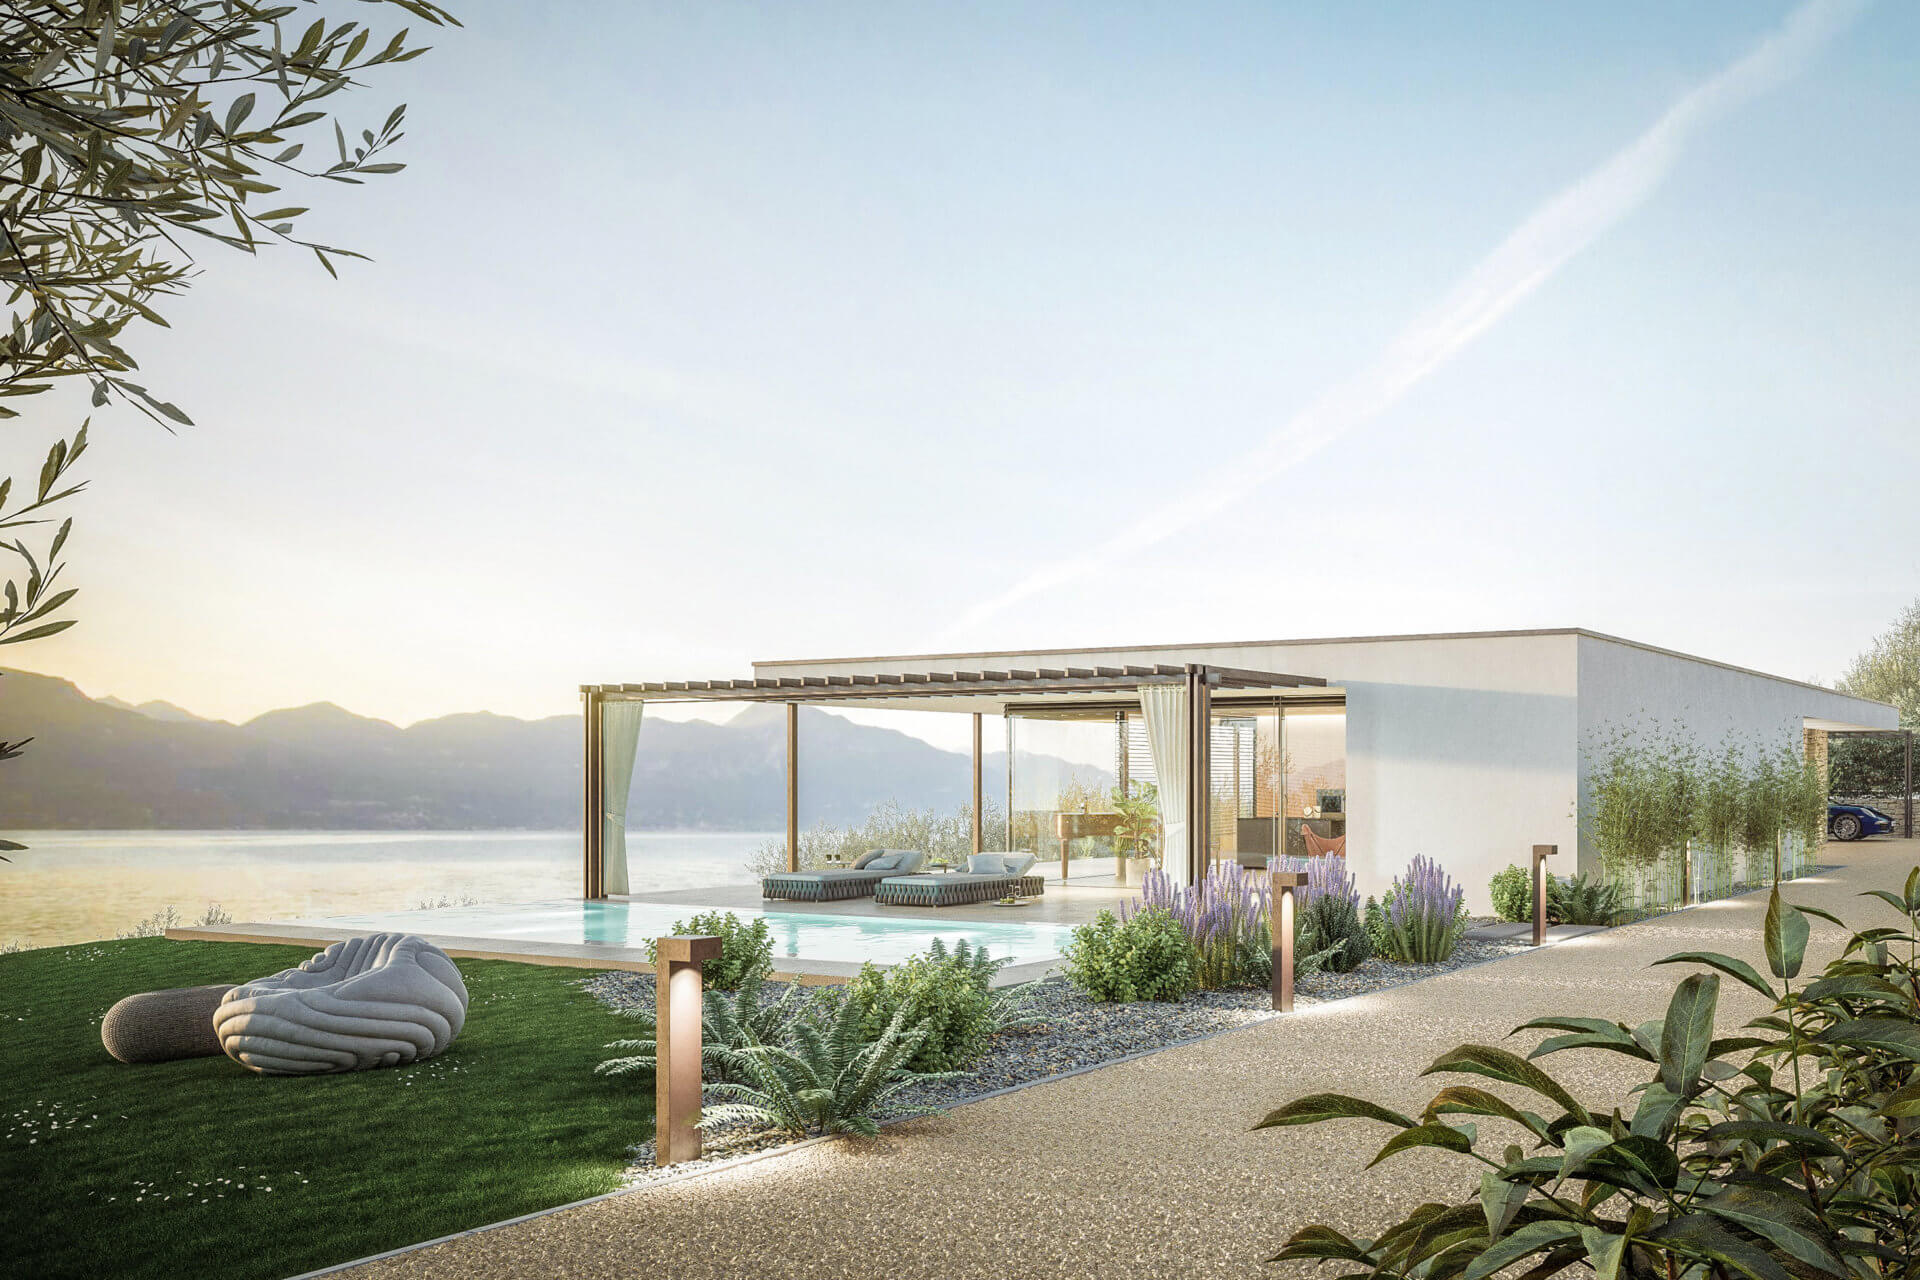 Torri del Benaco: Villa mit Traumblick auf den Gardasee